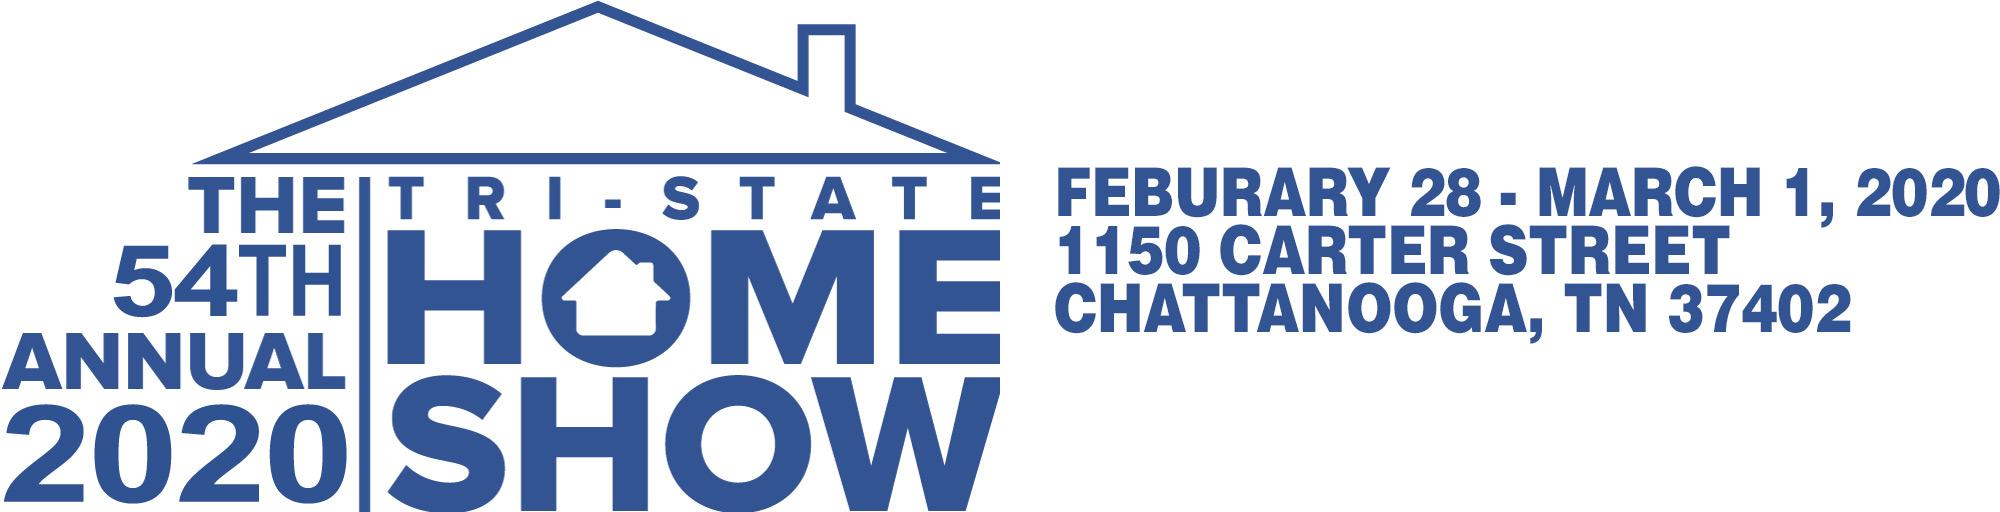 Evansville Home Show 2020.Evansville Home Show 2020 Show 2020 Vacatureinzuidholland